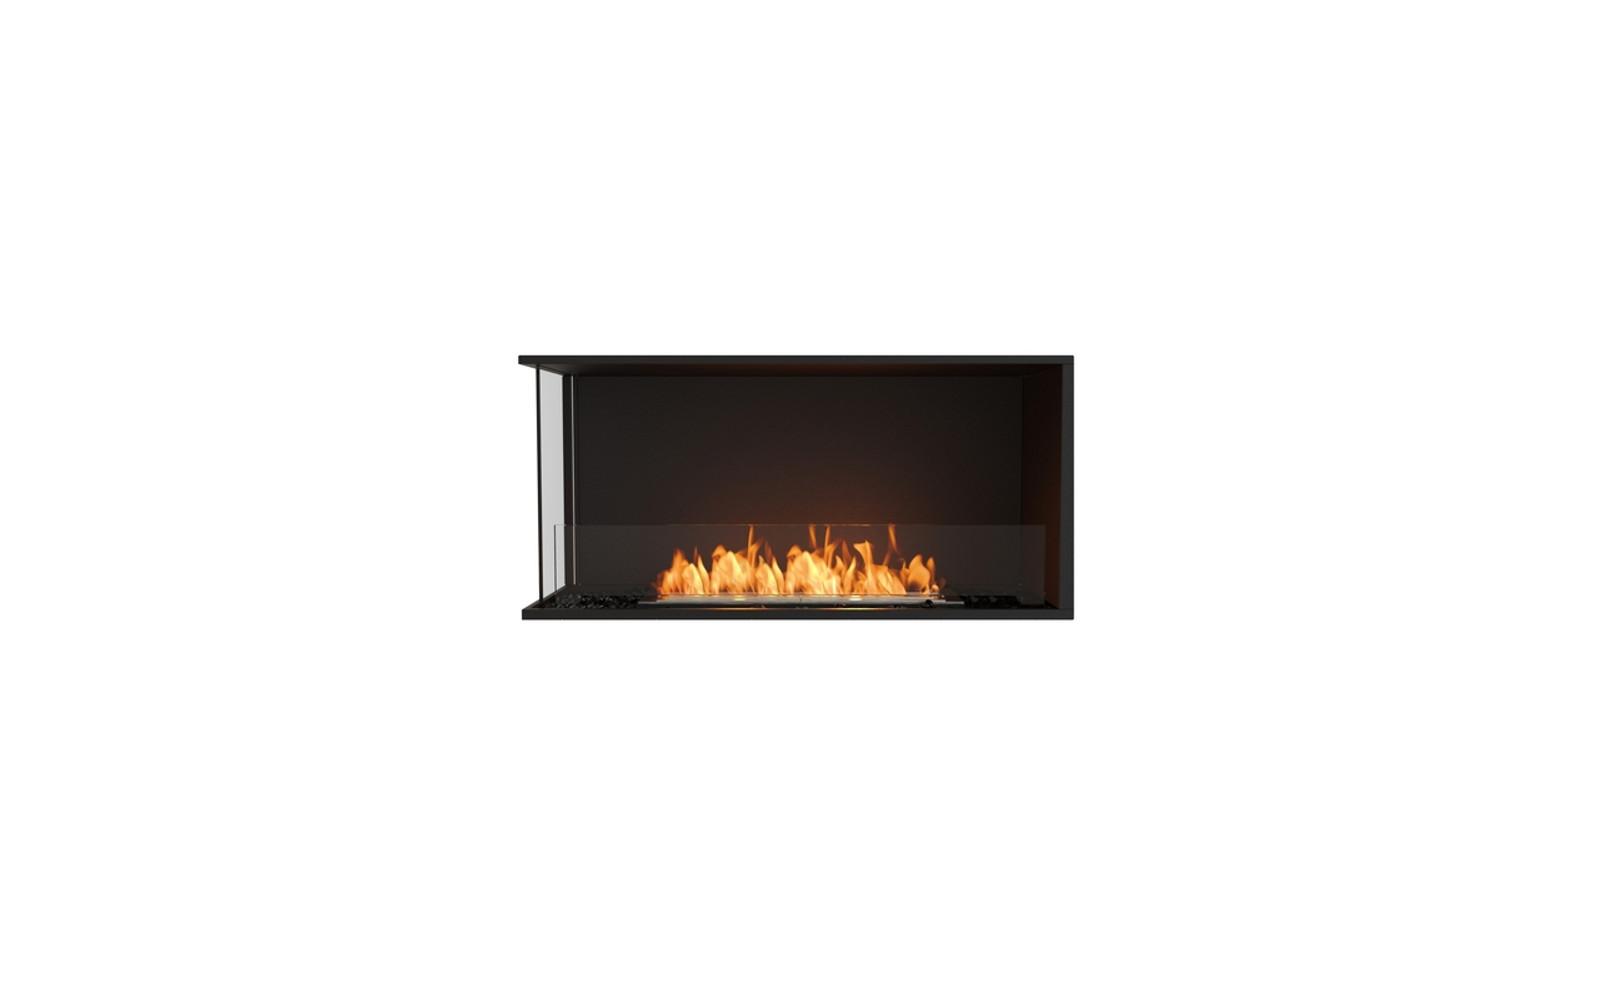 Flex Left Corner - All Flame